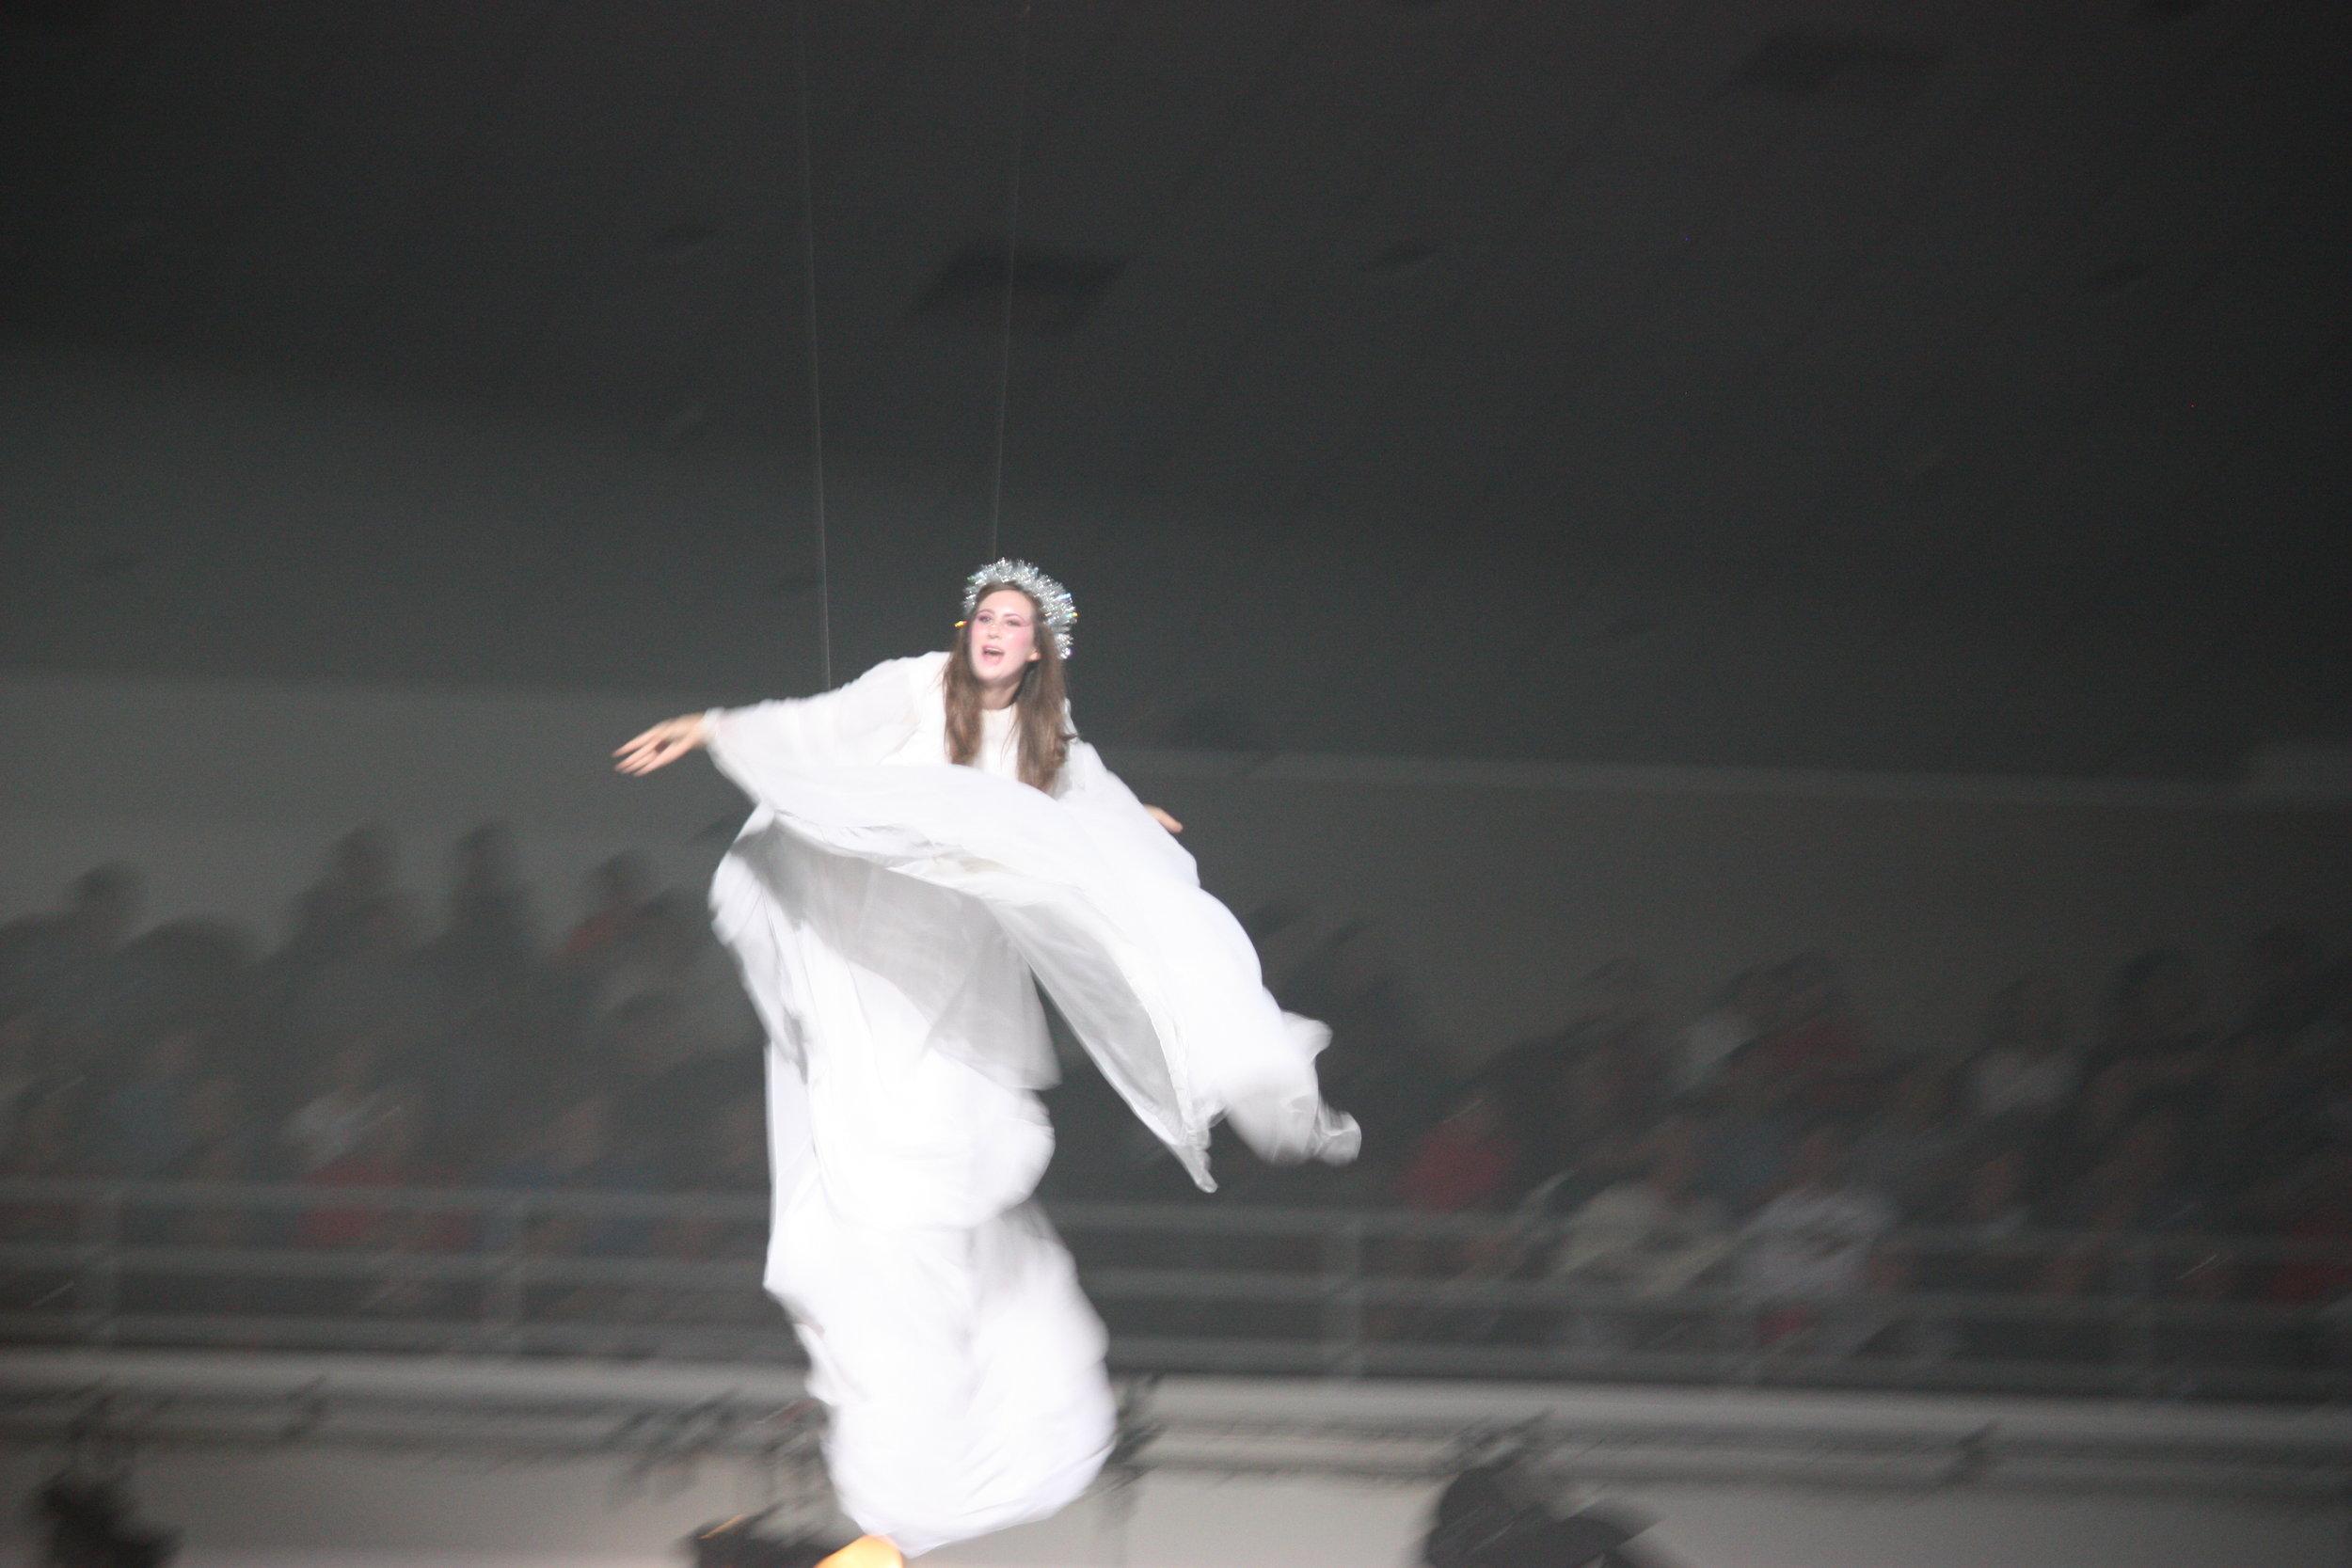 200912 - SOW - 1.JPG